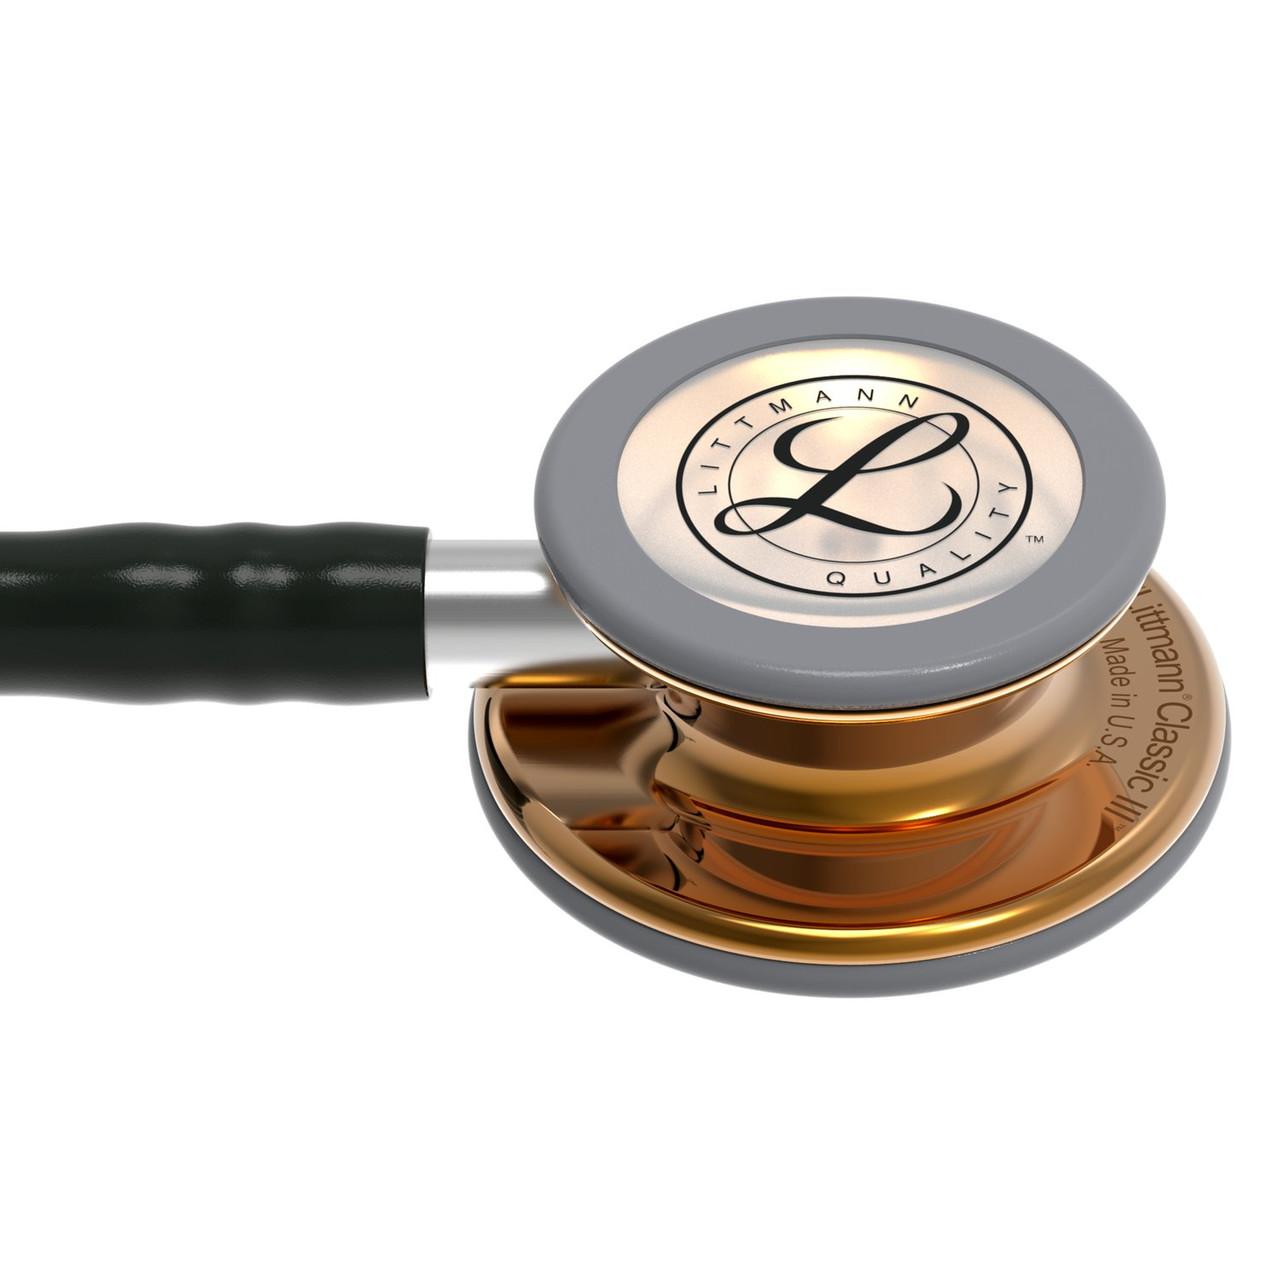 Littmann Classic III Stethoscope, Black HP Copper, 5646